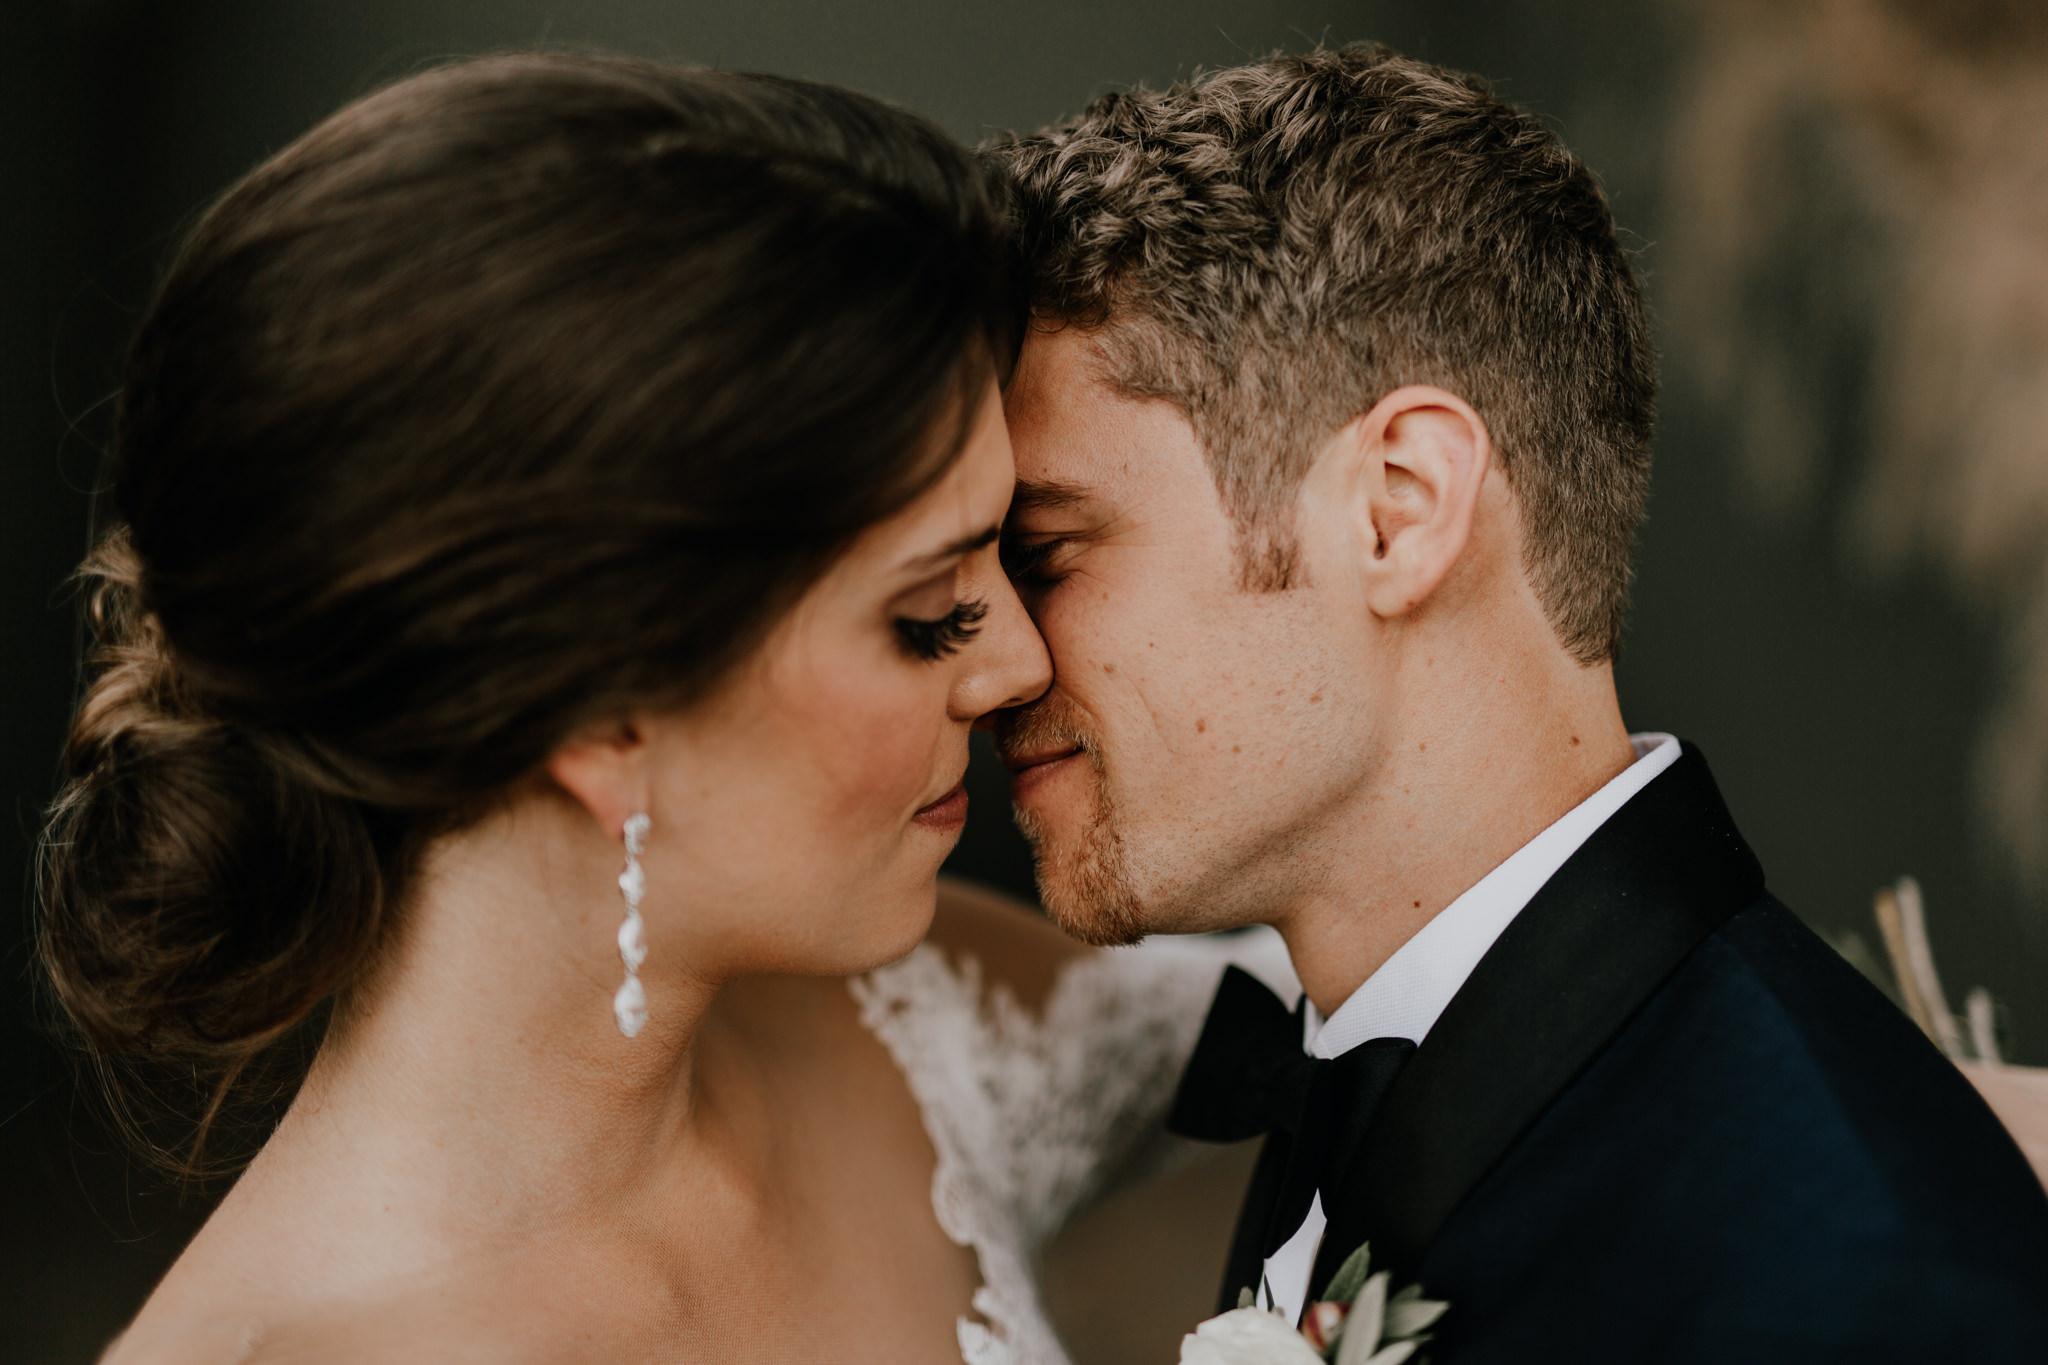 wedding-headlands-center-for-the-arts-sausalito-103.jpg